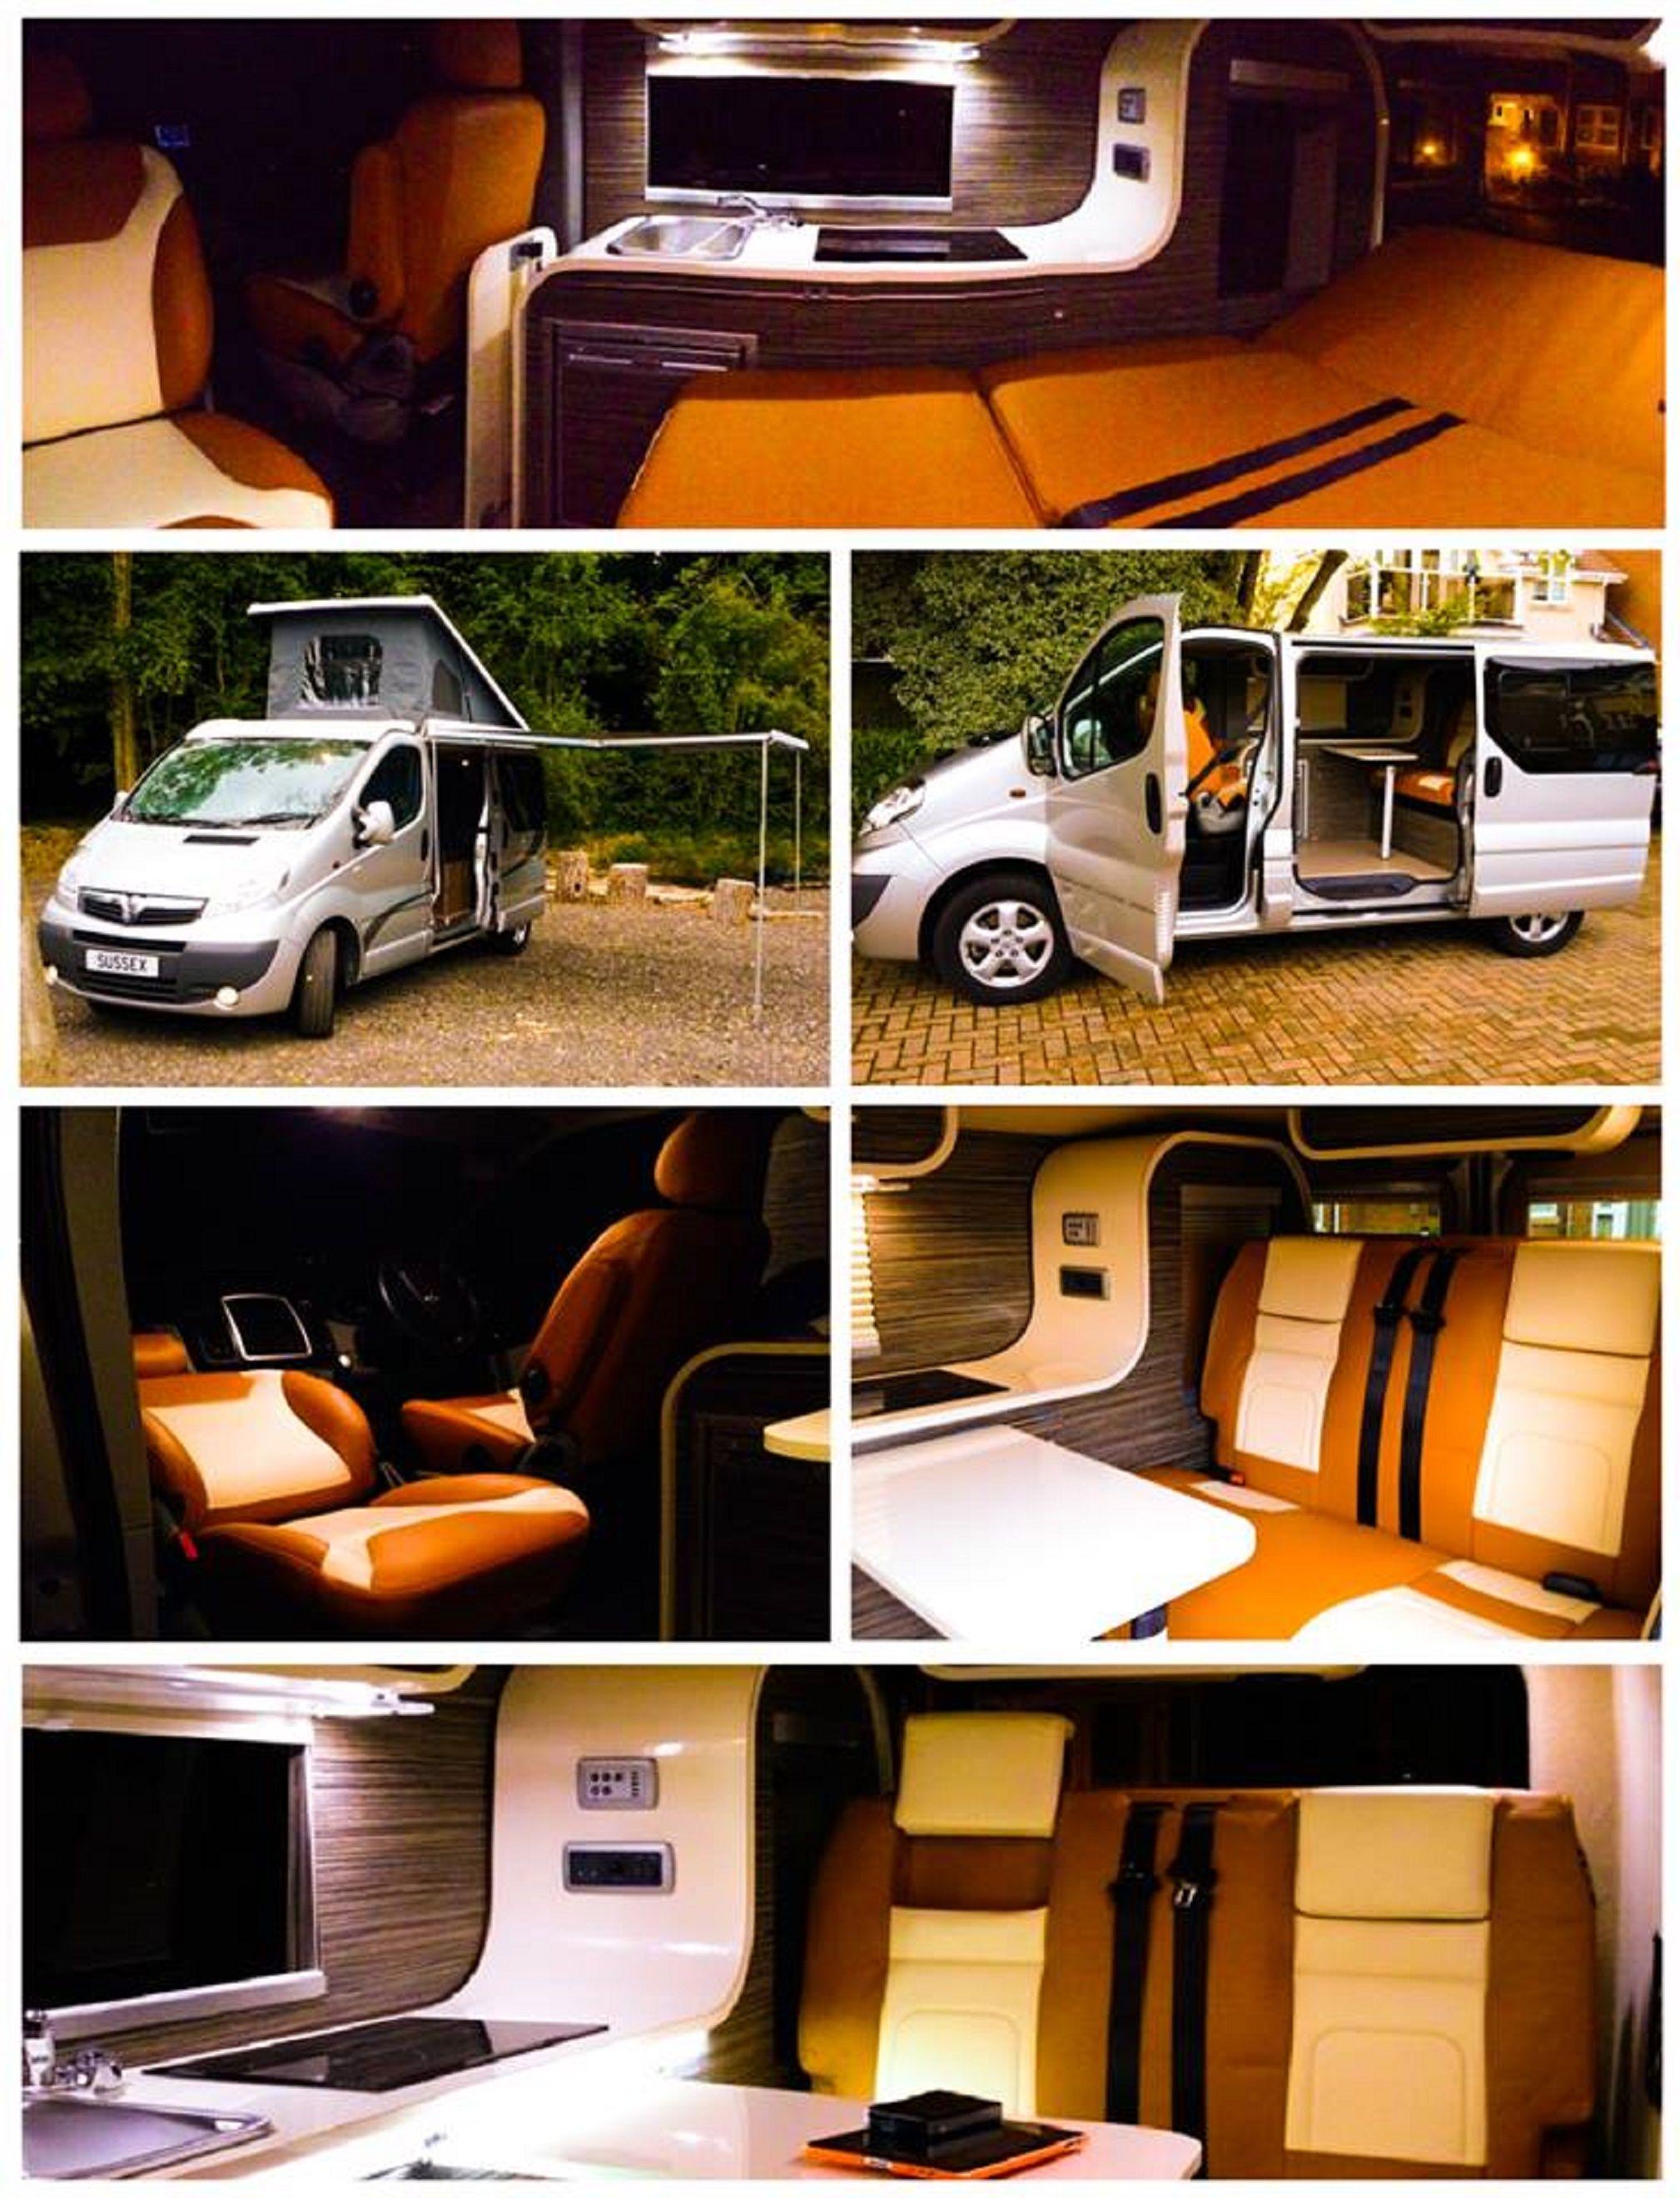 61 Vauxhall Vivaro Sportive Camper Van 147PS Luxury SUV Conversion